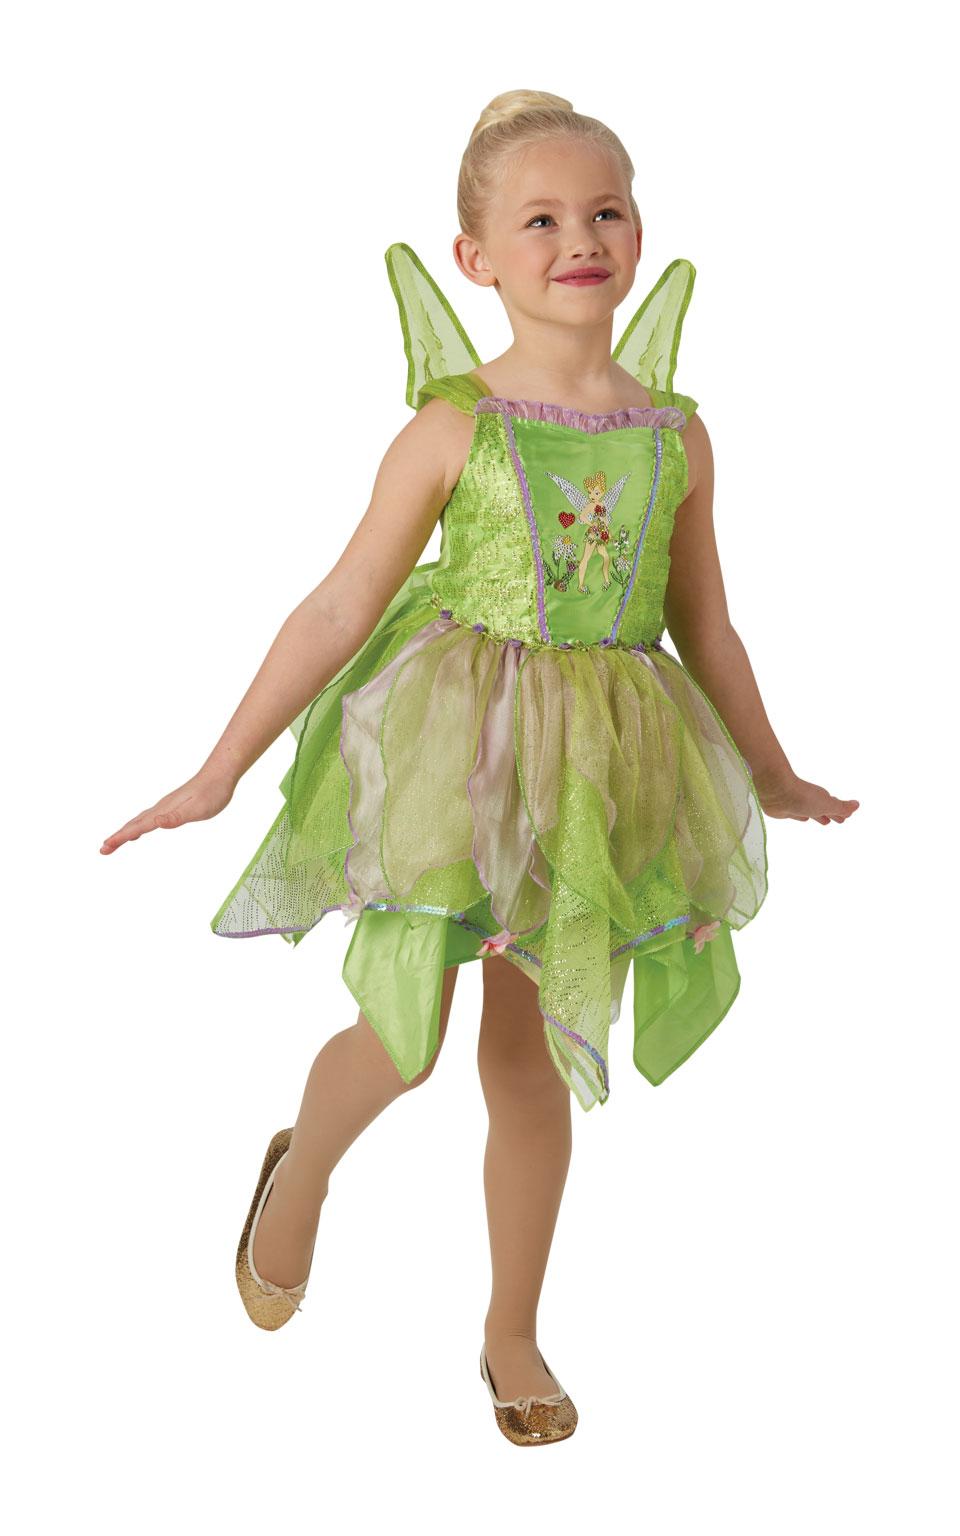 Rhinestone Tinkerbell Costume Tv Book And Film Costumes